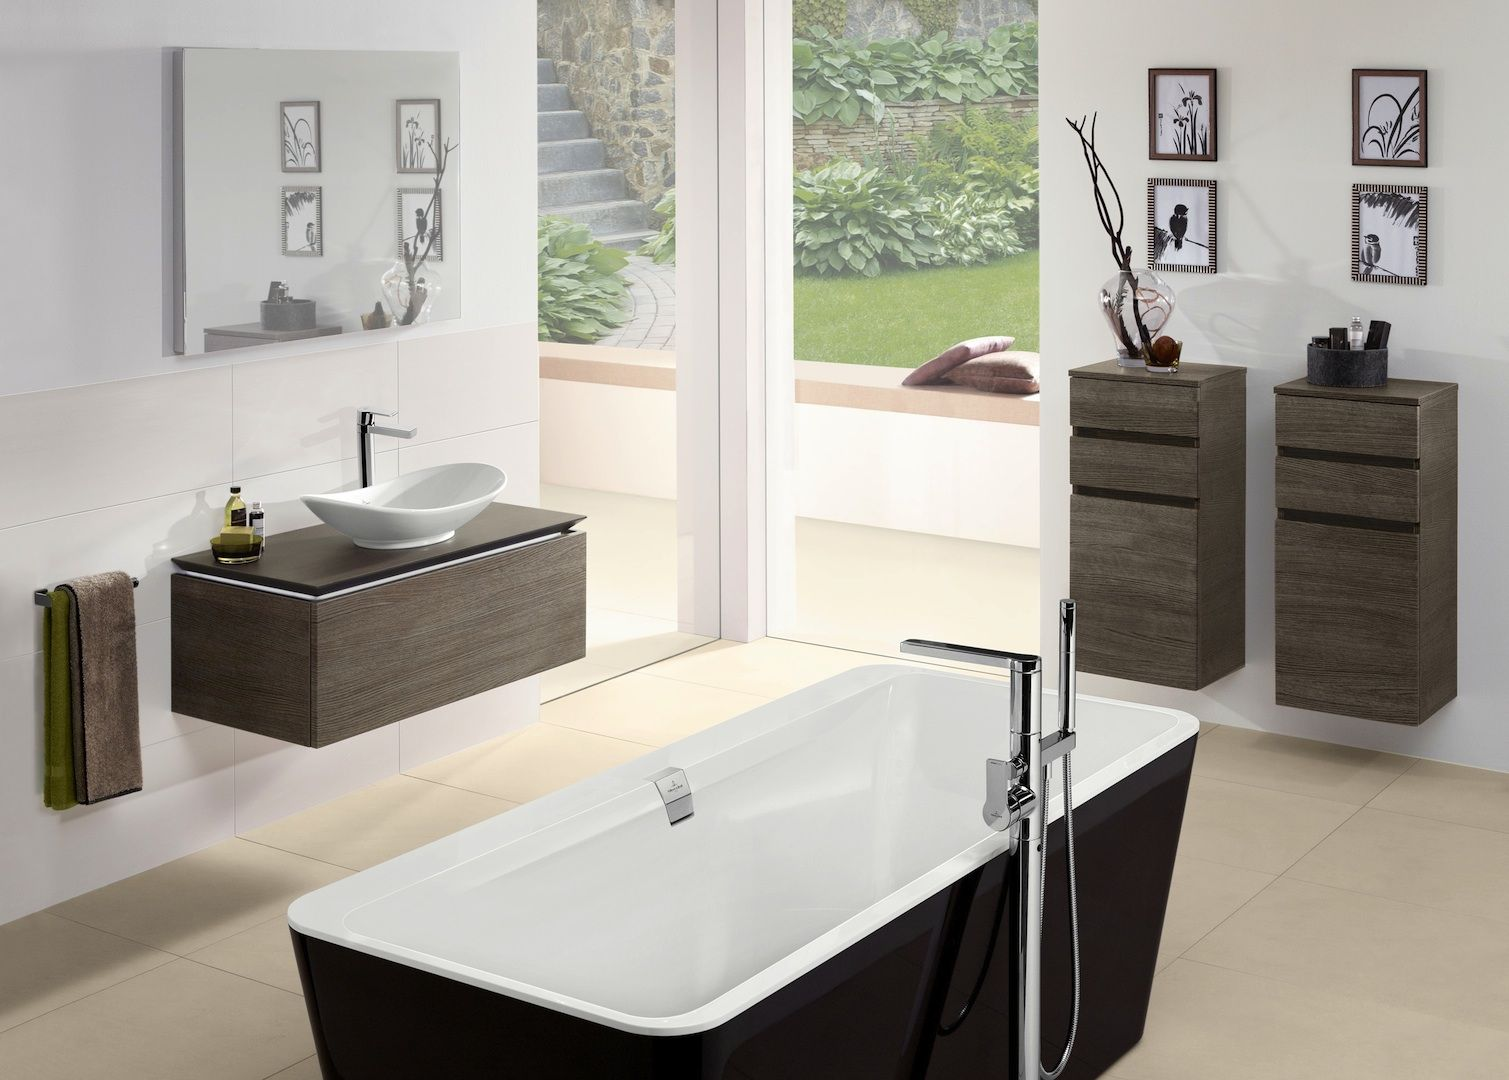 Badkamermeubels en bad Legato van Villeroy & Boch | Badkamermeubels ...